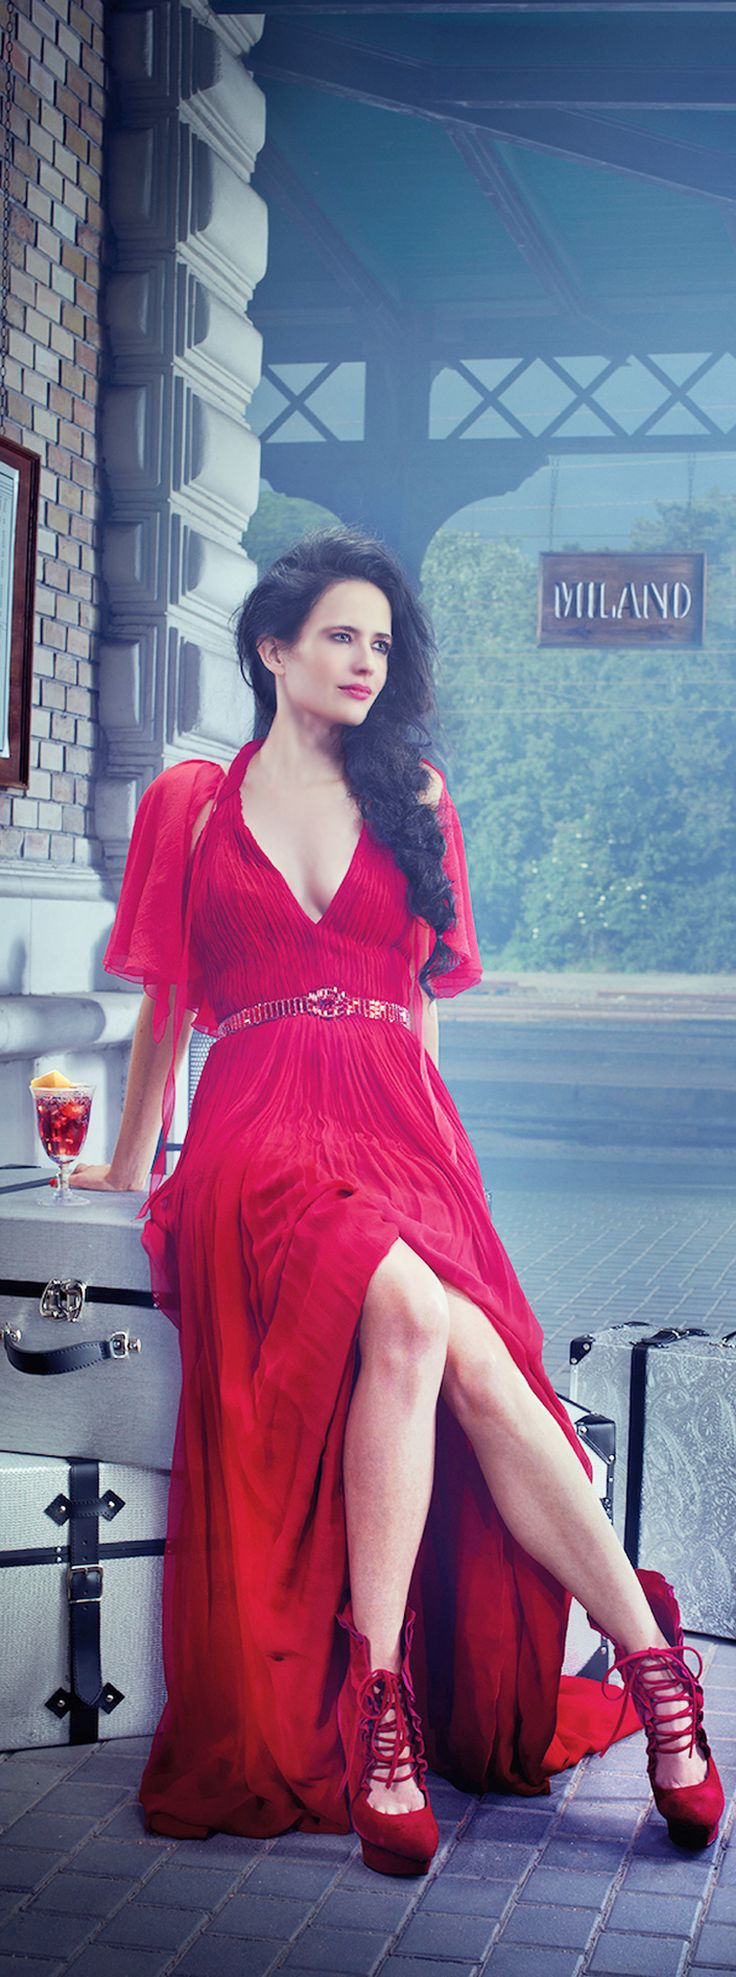 131 best Girl Crush! images on Pinterest | Beautiful women, French ...